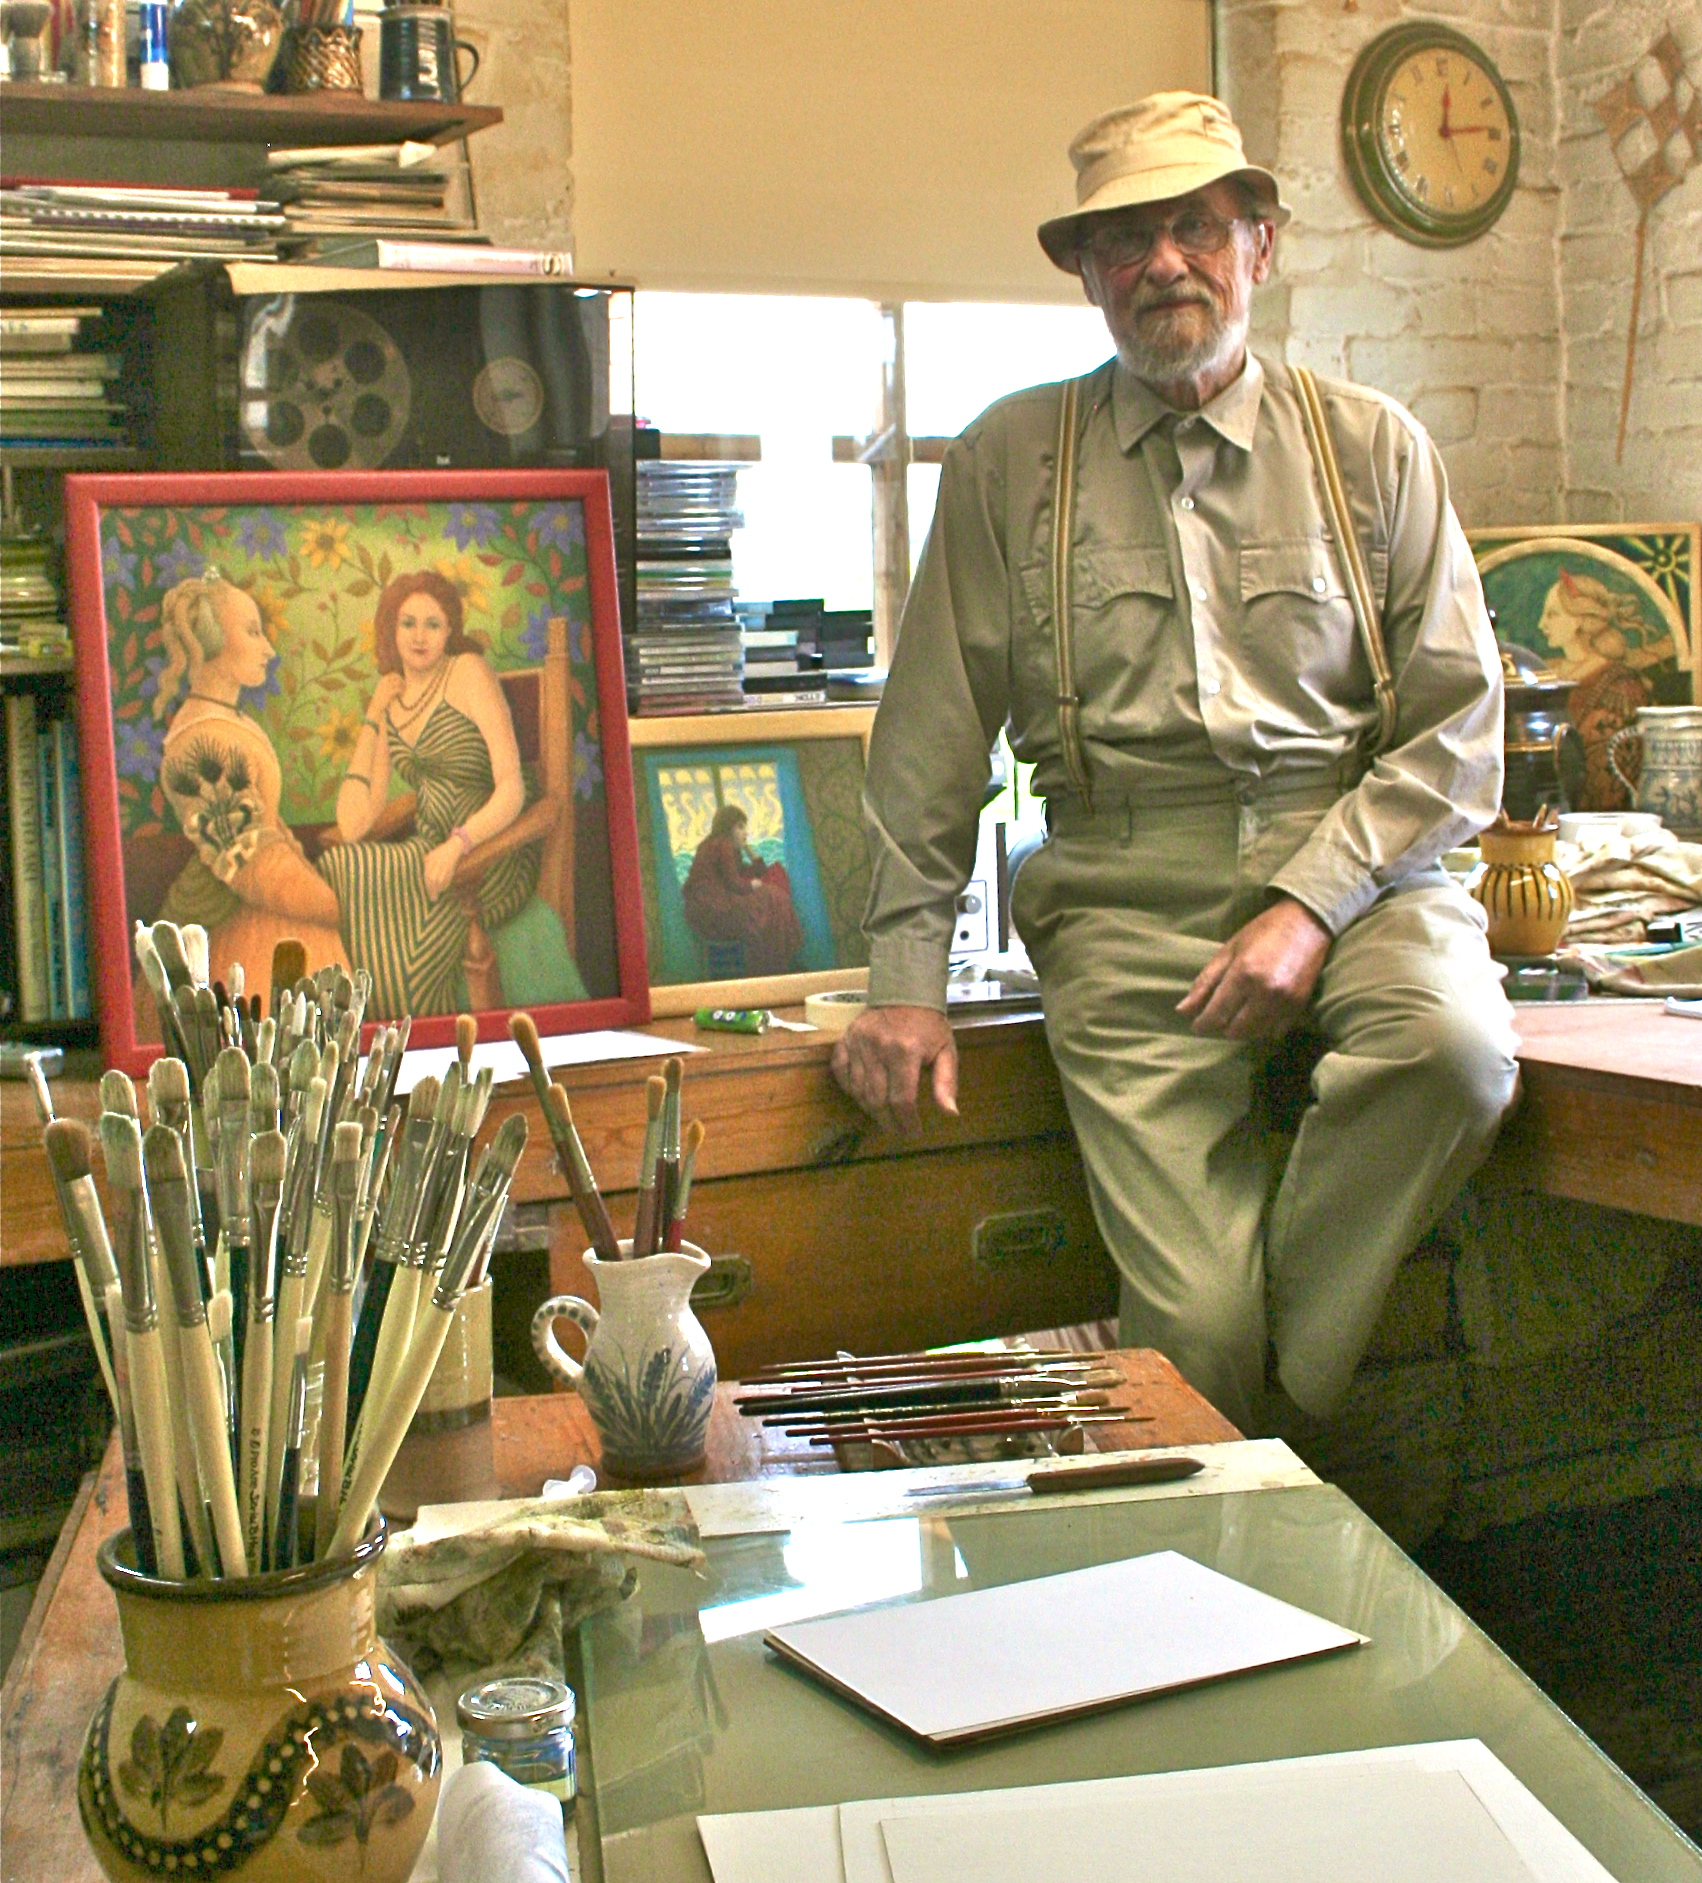 Harleston_and_Waveney_Art_Trail_Alan_Frewin_in_his_Studio_Credit_Millhouse_Pottery.jpg